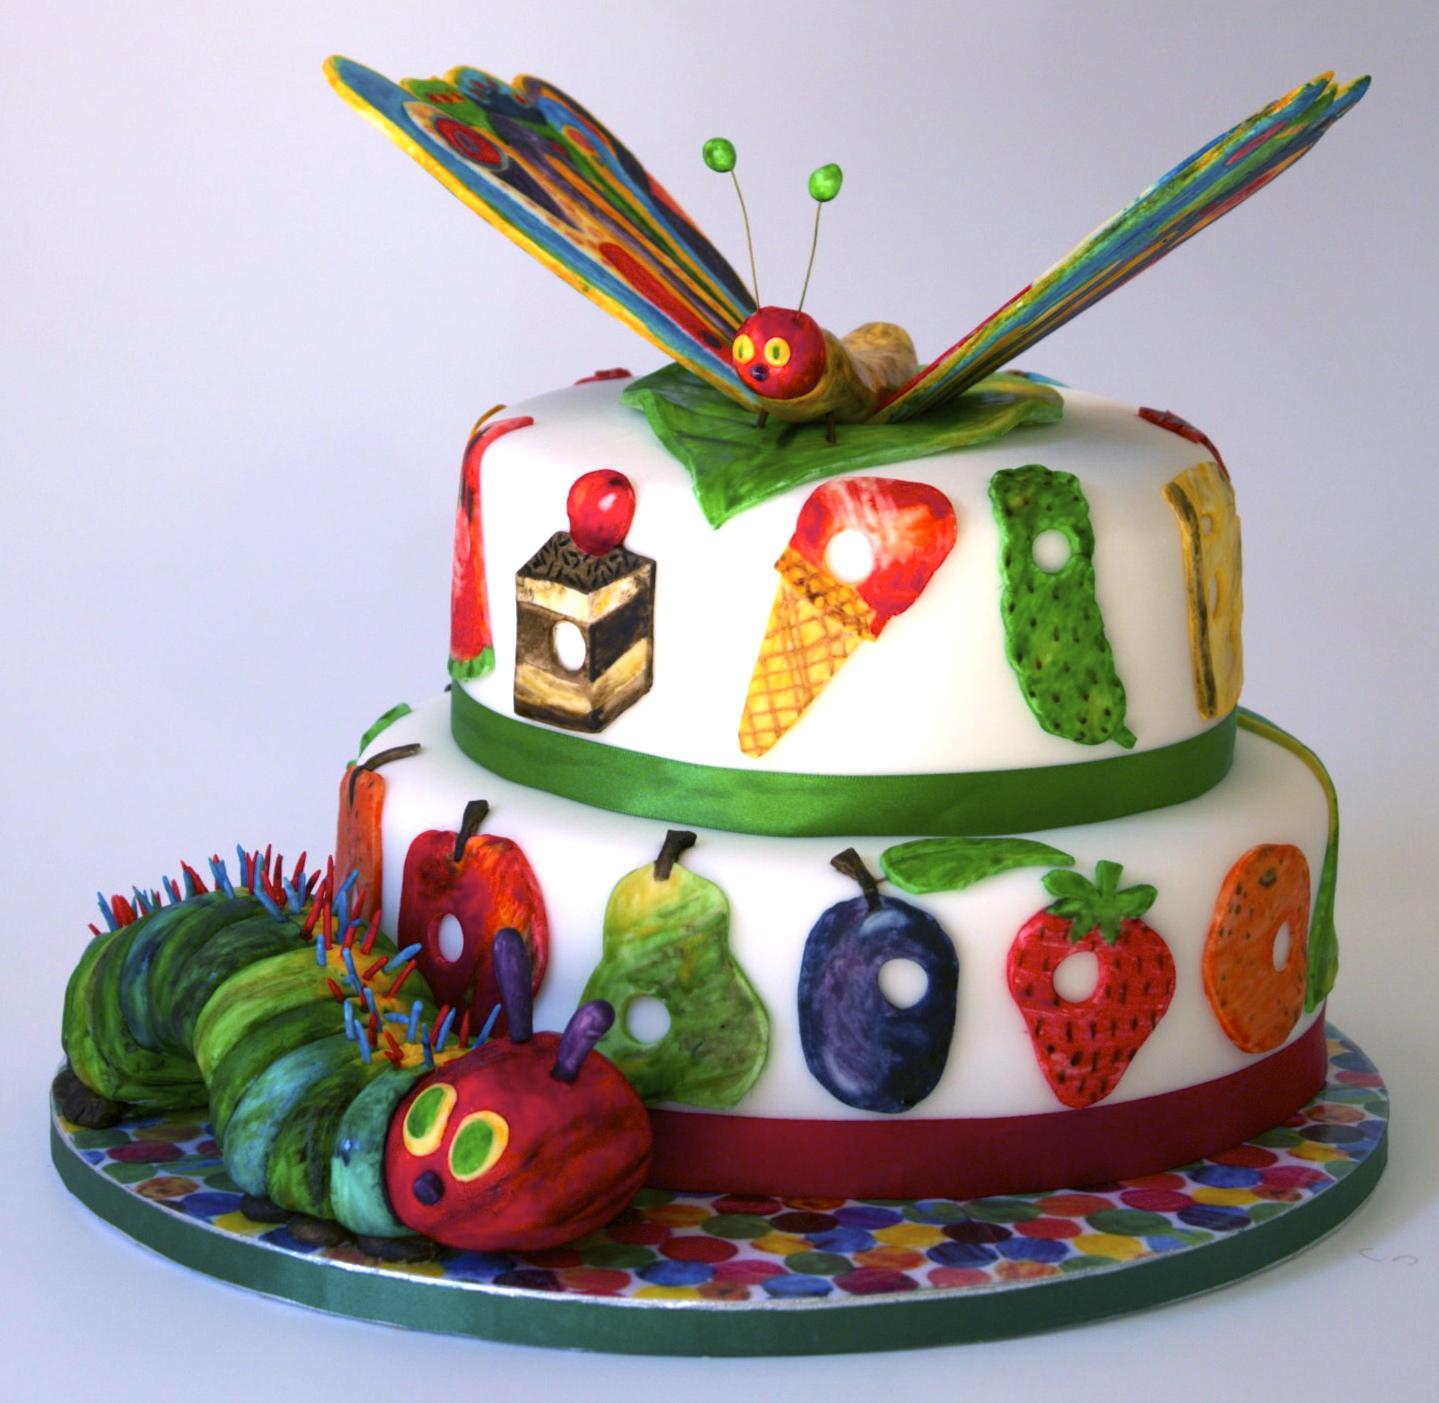 The Very Hungry Caterpillar Chocolate Cake